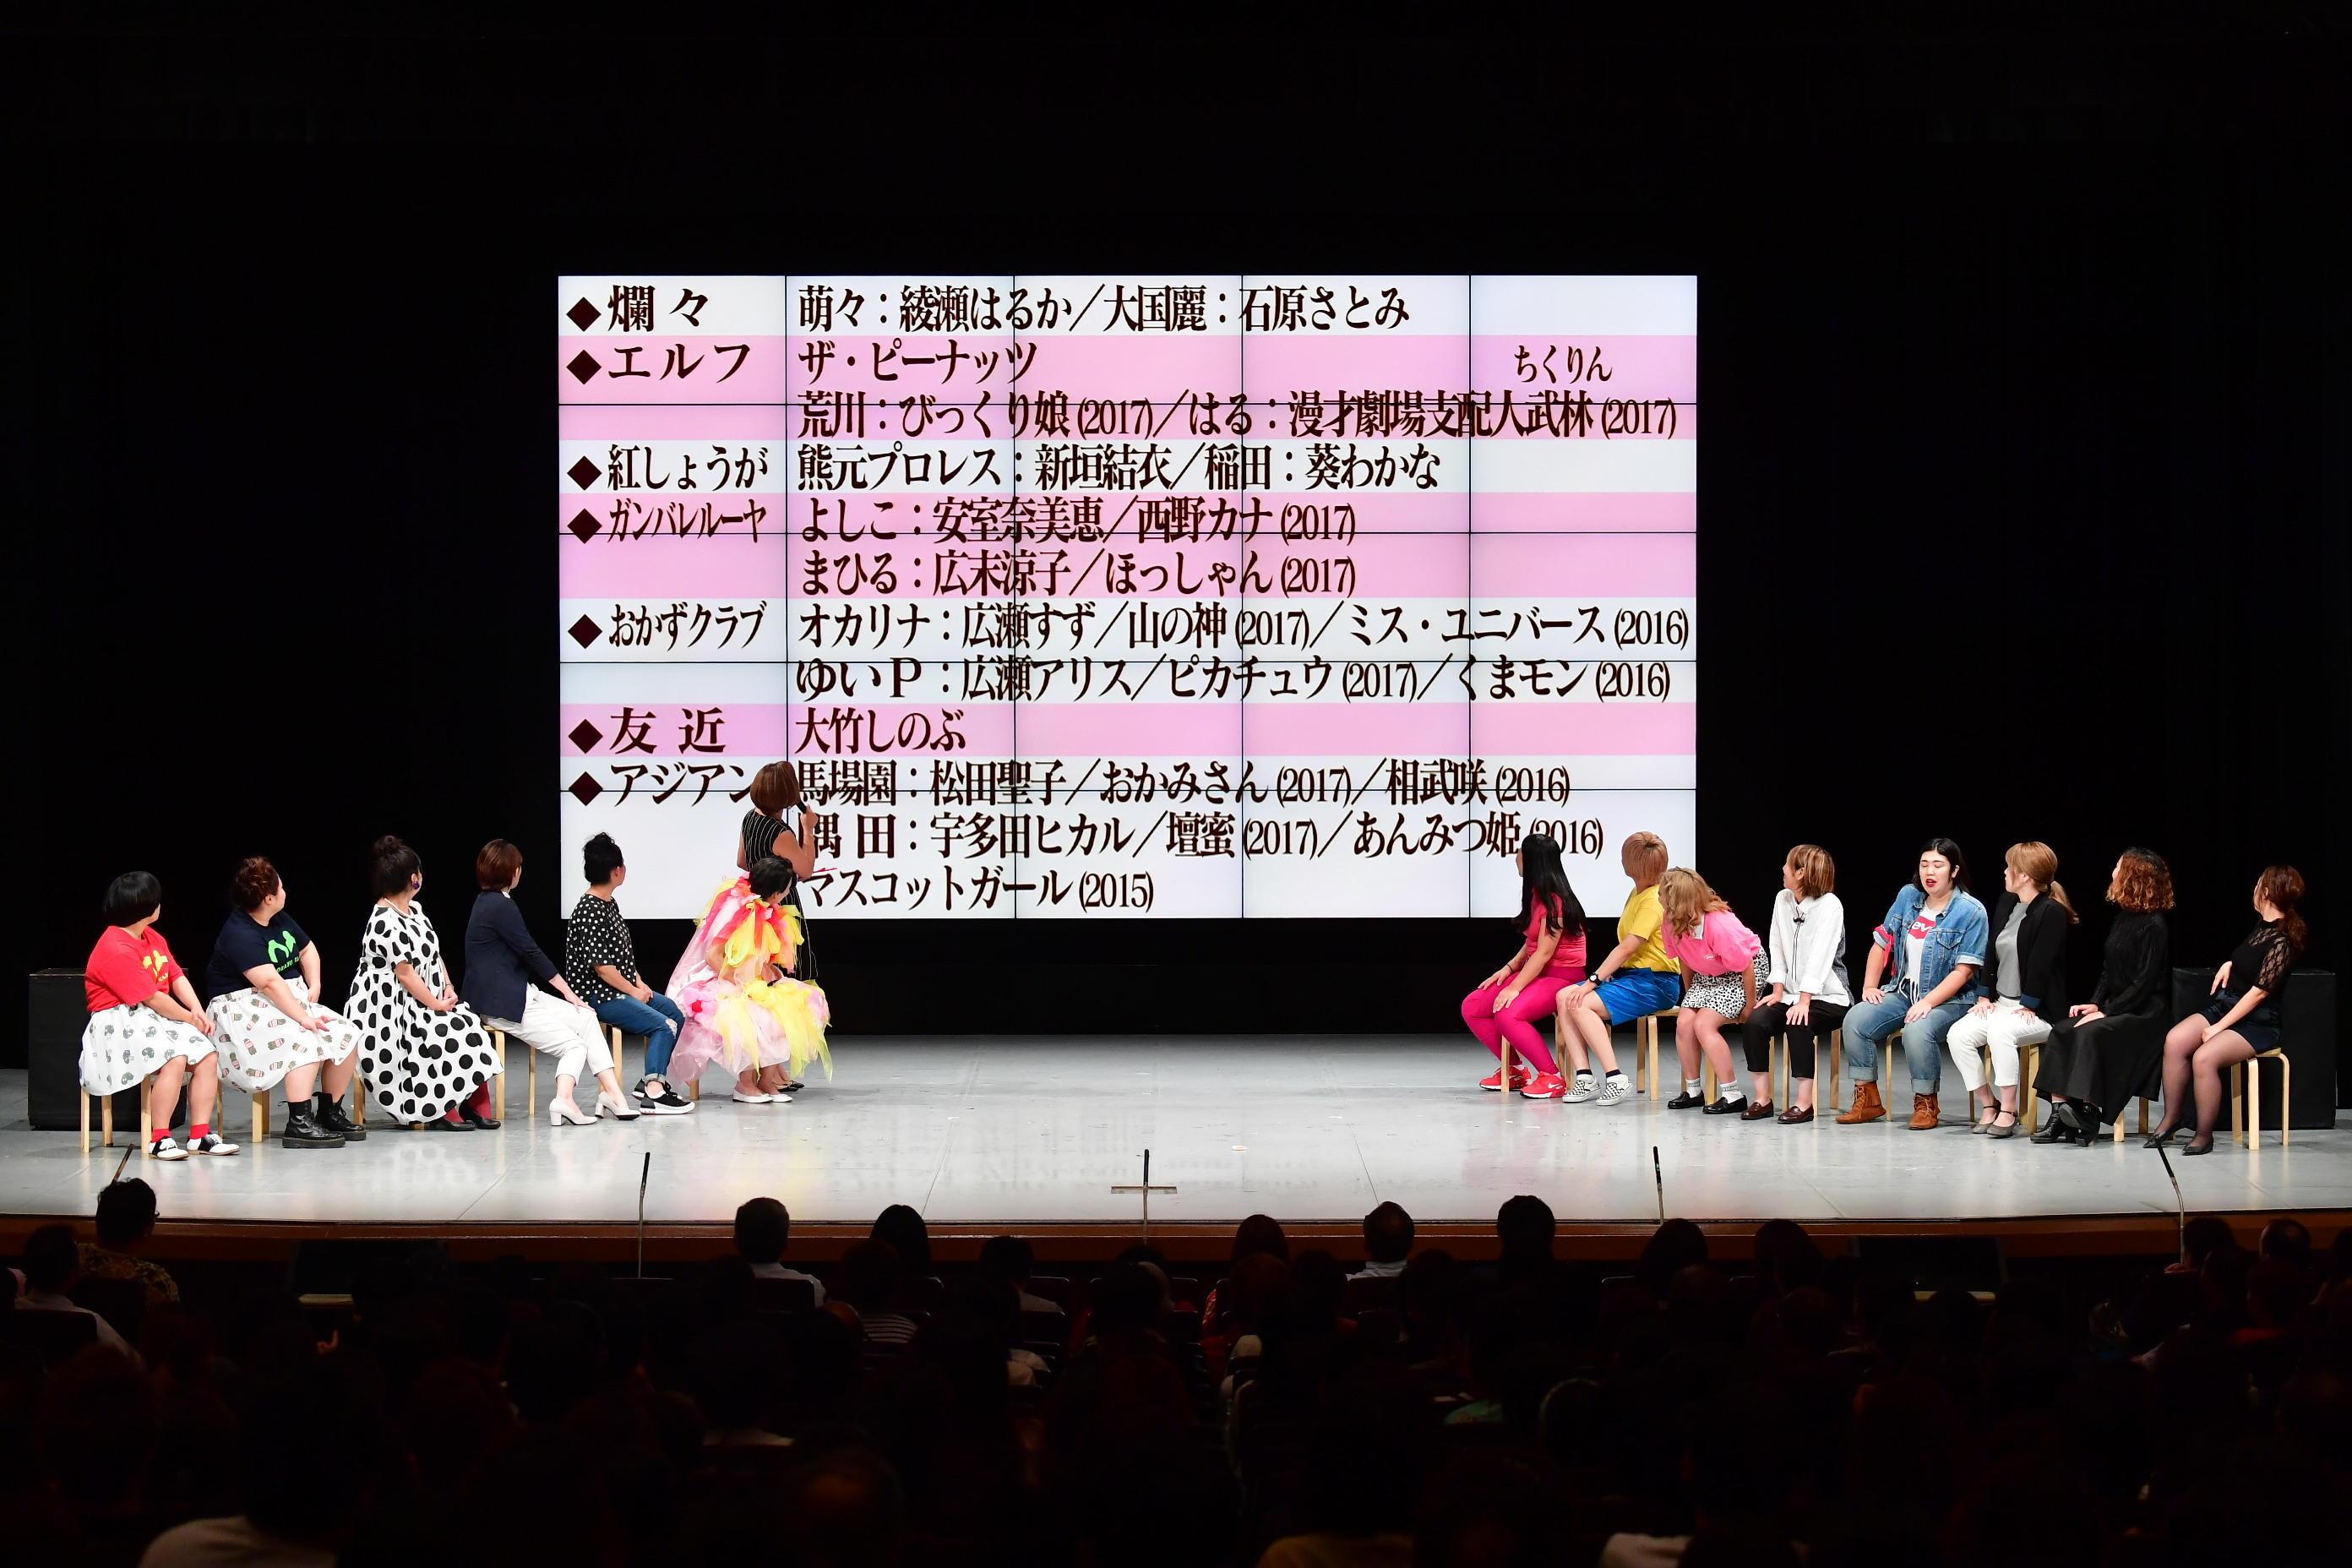 http://news.yoshimoto.co.jp/20180831235018-b4899cca7cbd6d555d6b9b7e17727c18c0052b73.jpg